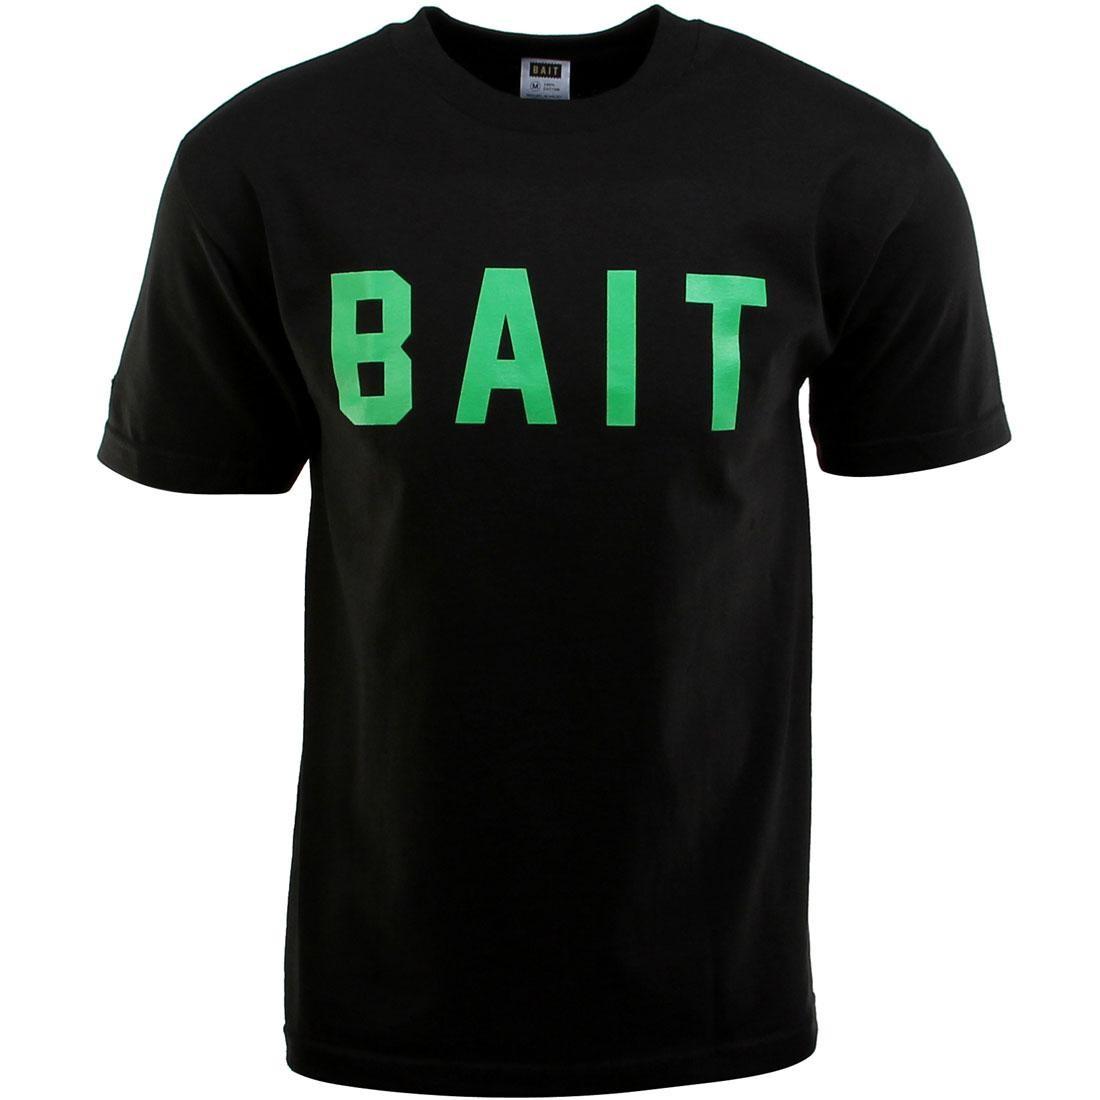 BAIT Logo Tee (black / green)